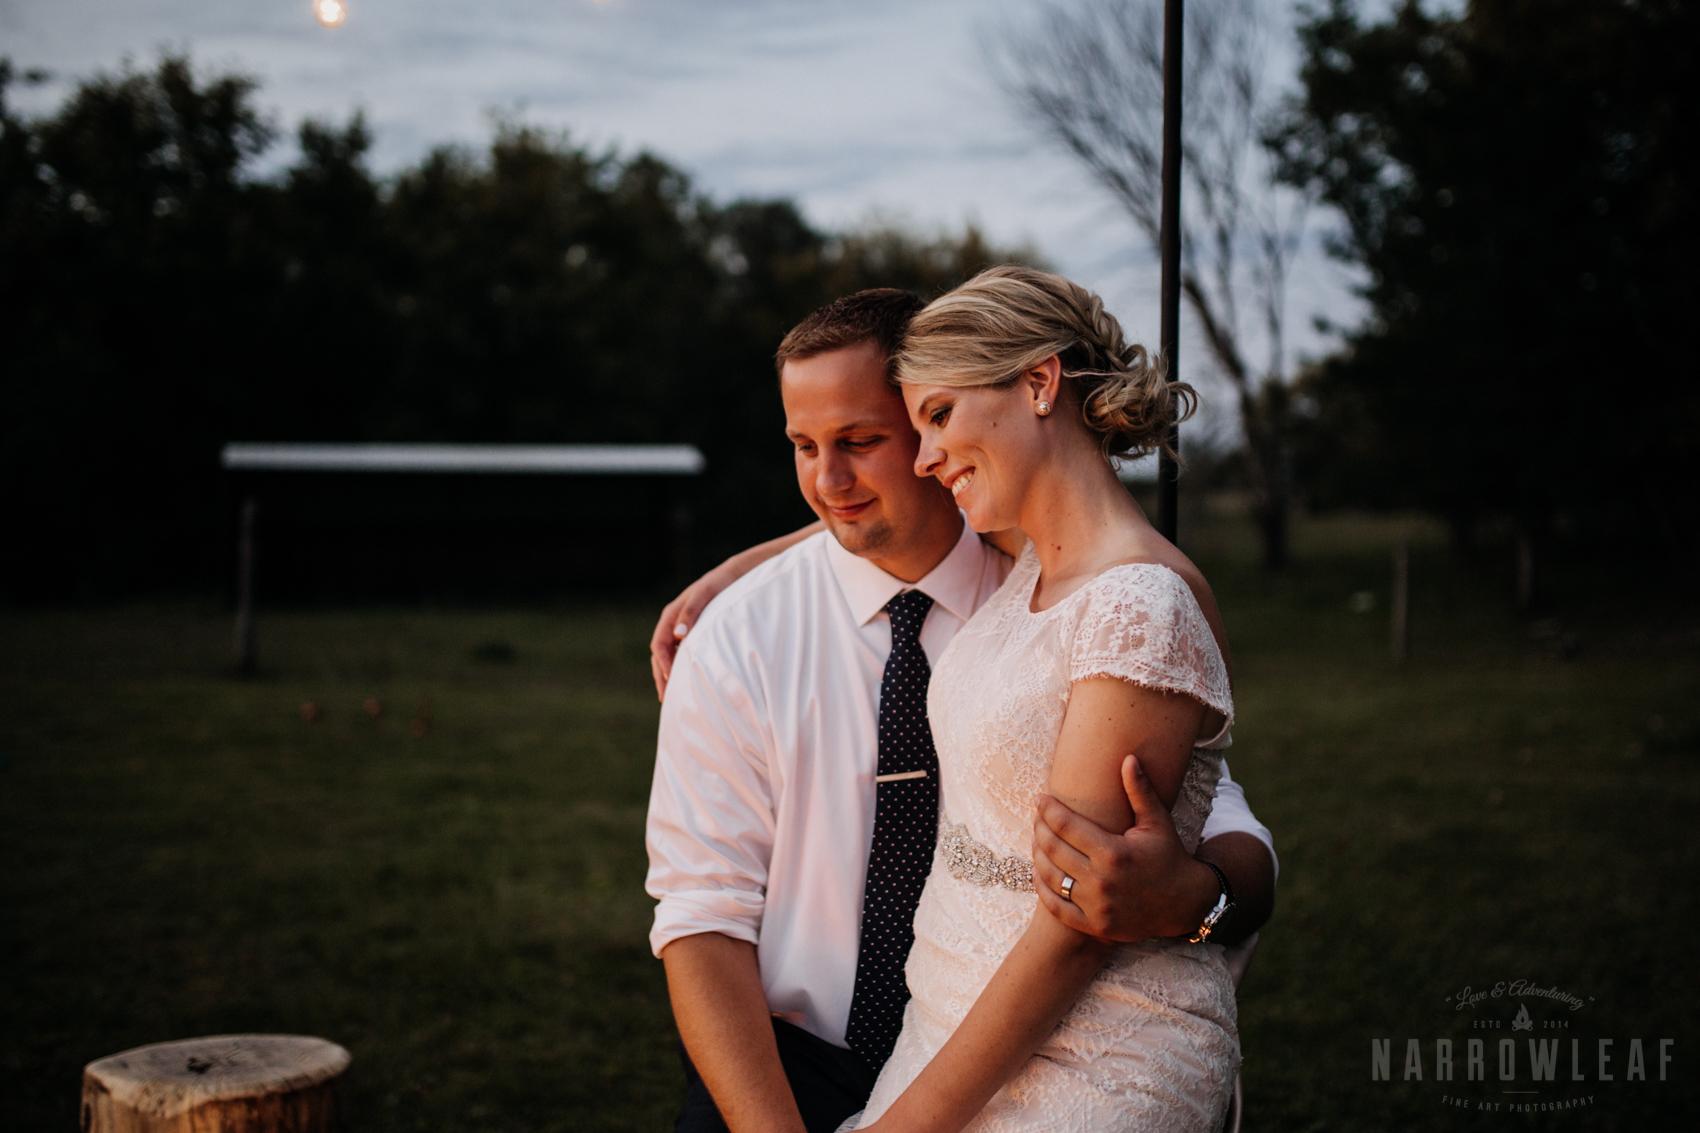 bride-groom-cuddling-by-the-bonfire-under-cafe-lights-night-35.jpg